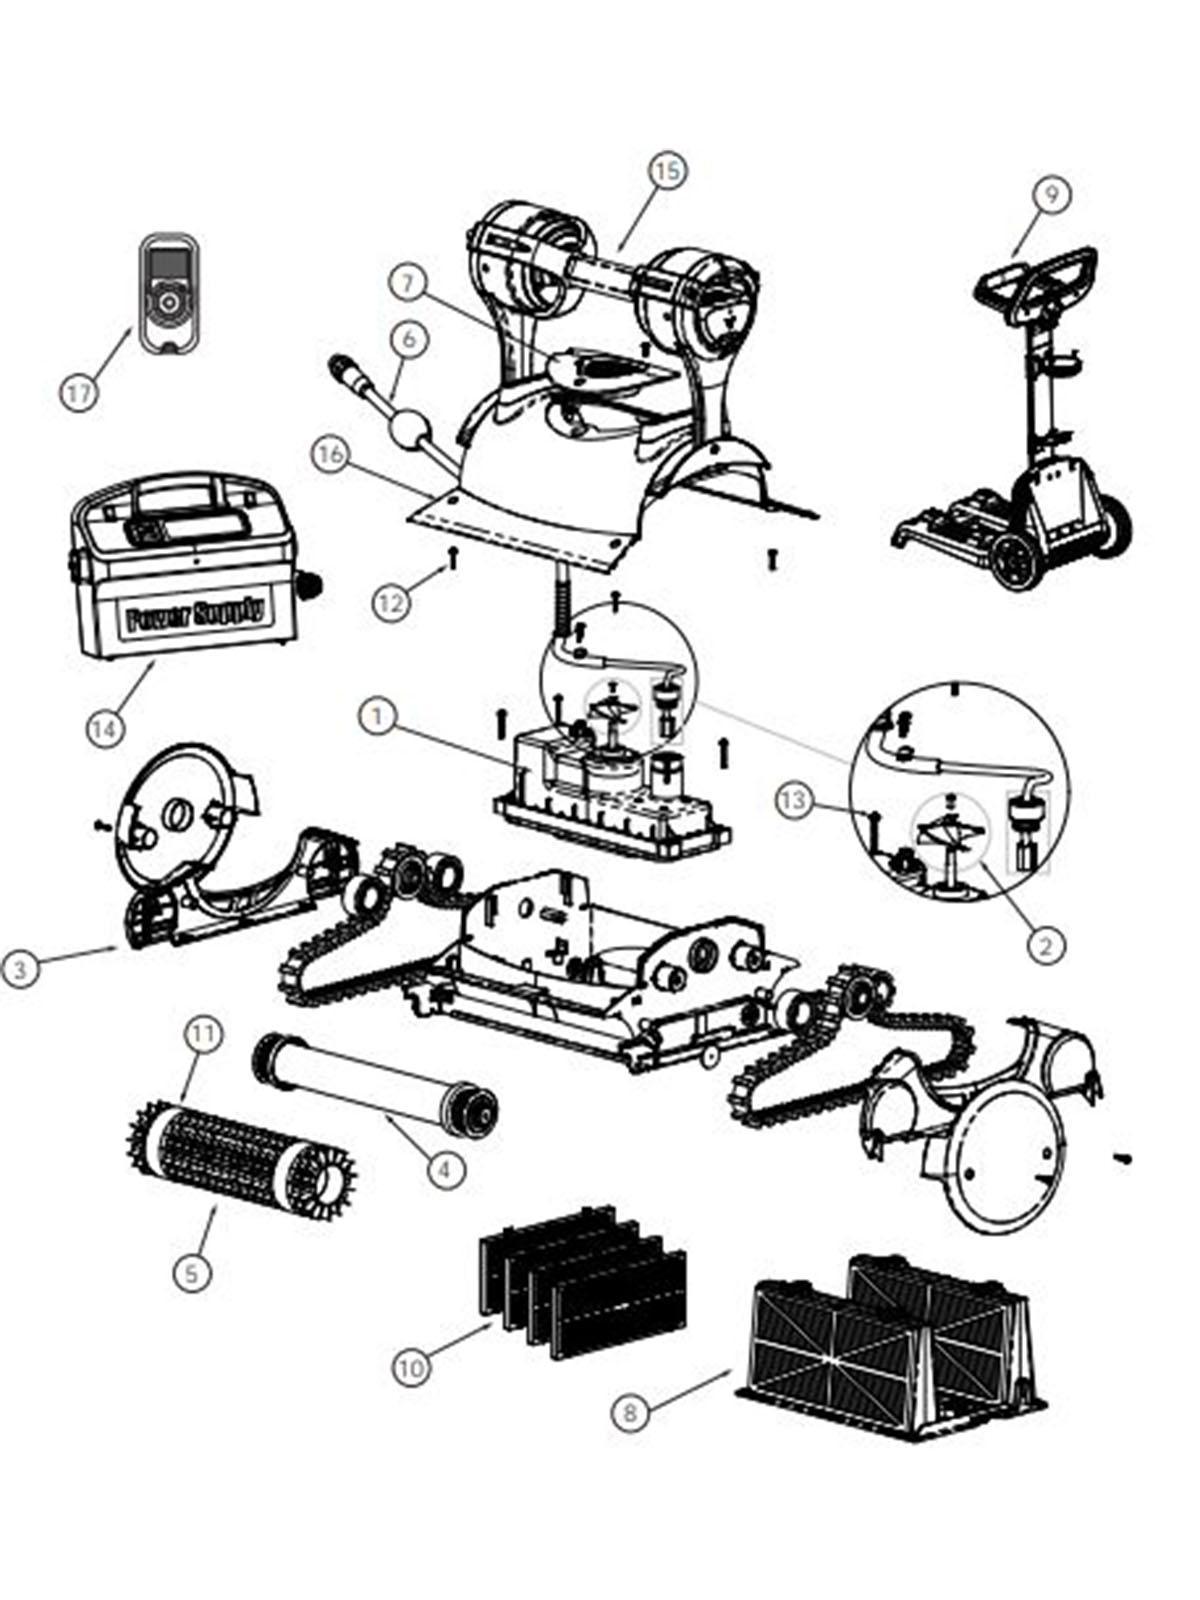 Pentair Kreepy Krauly Prowler 830 Inground Robotic